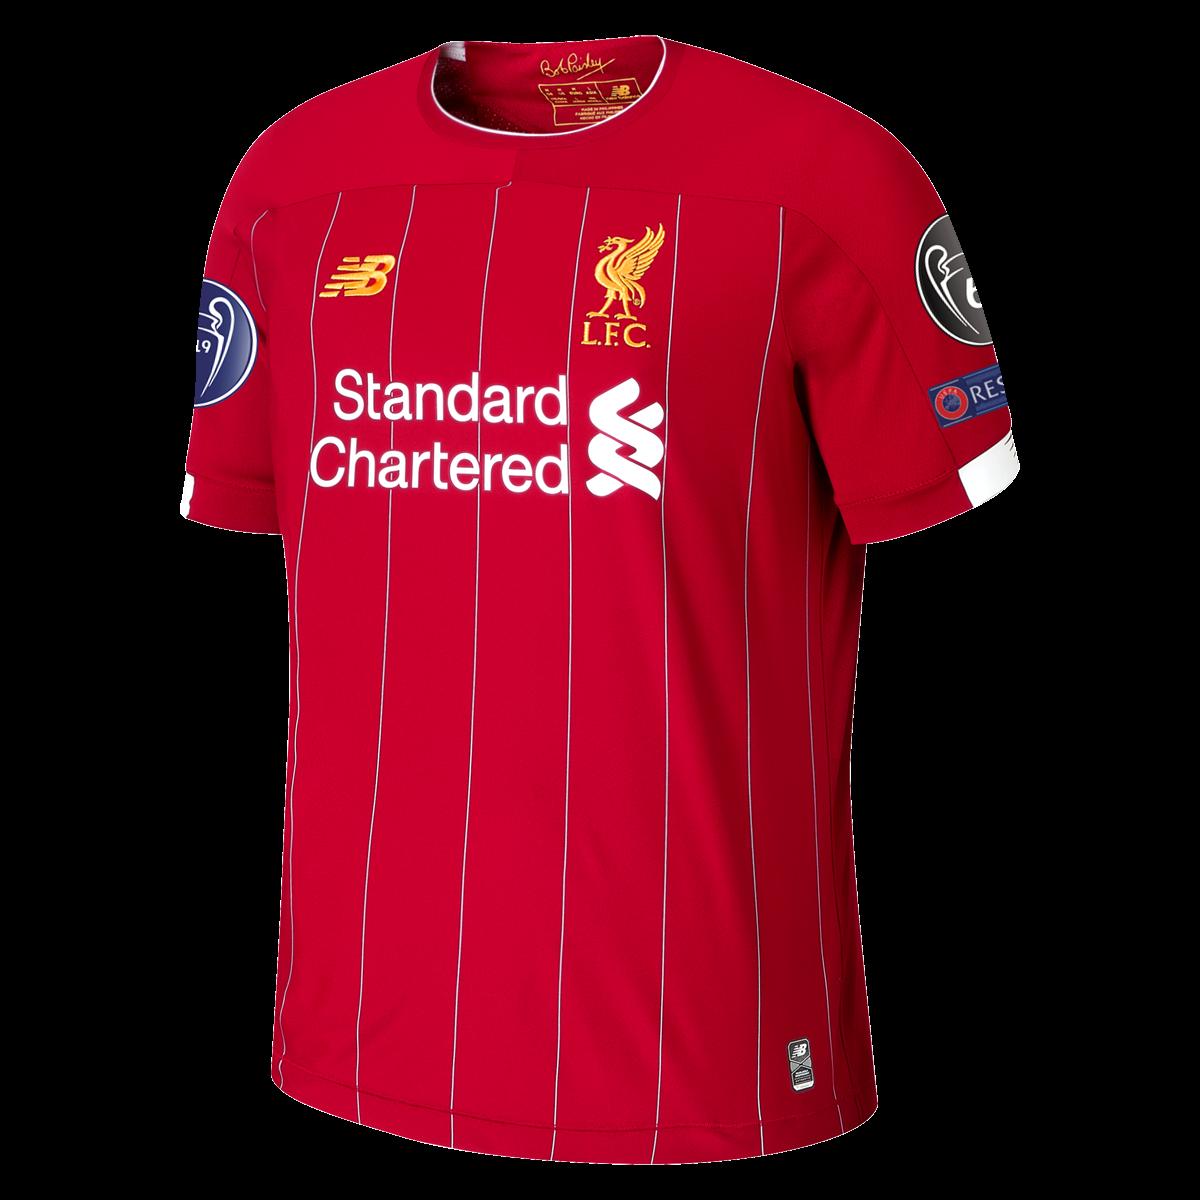 New Balance Liverpool Home Ucl Jersey 19 20 3xl Ucl Jersey Jersey In 2020 Liverpool Trikot Liverpool Trikot